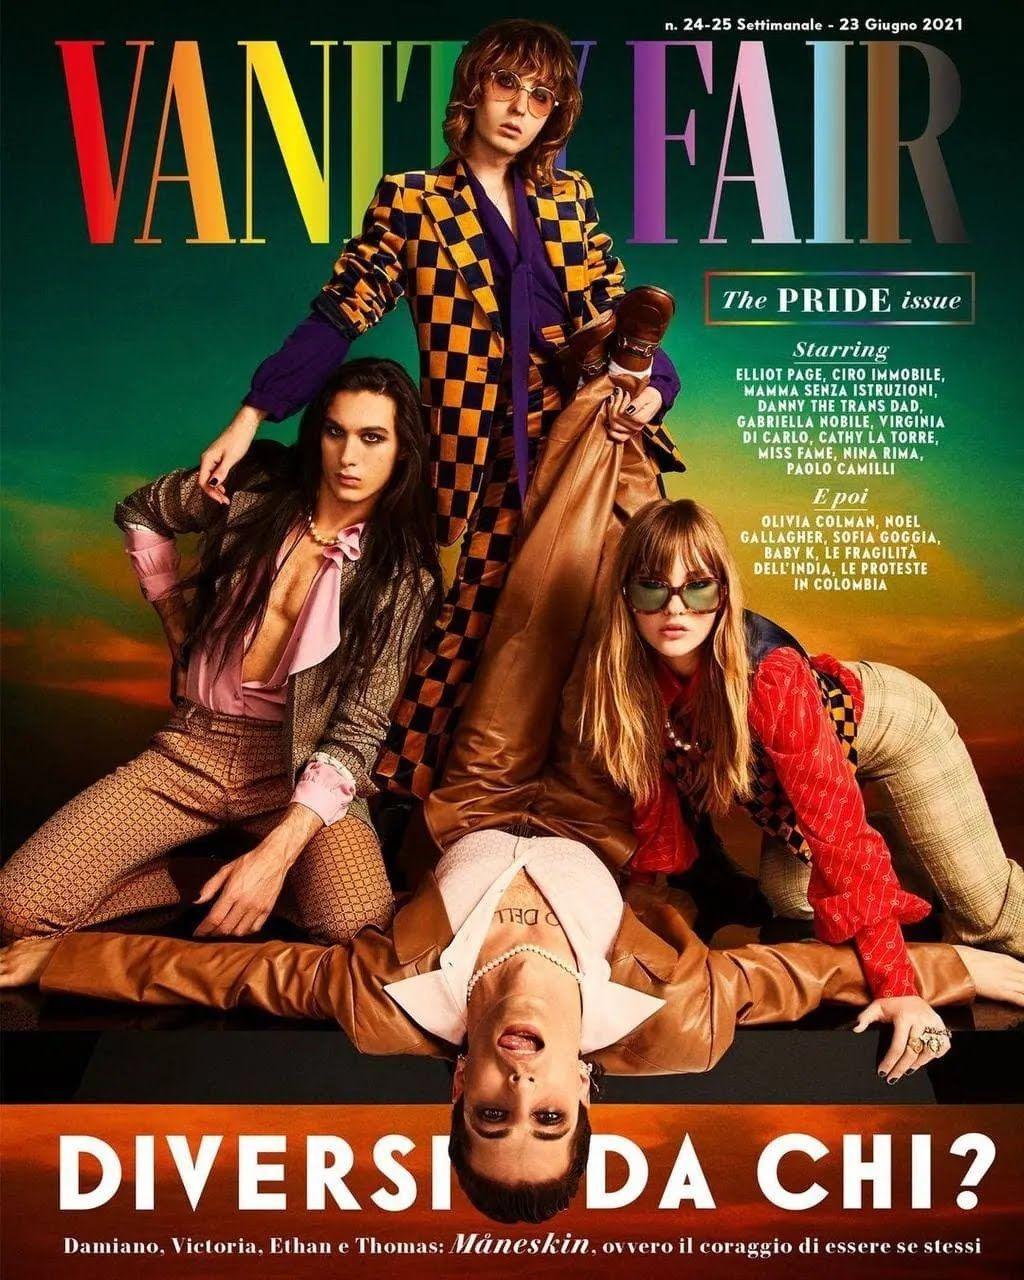 Maneskin украсили обложку глянцевого журнала Vanity Fair Italia